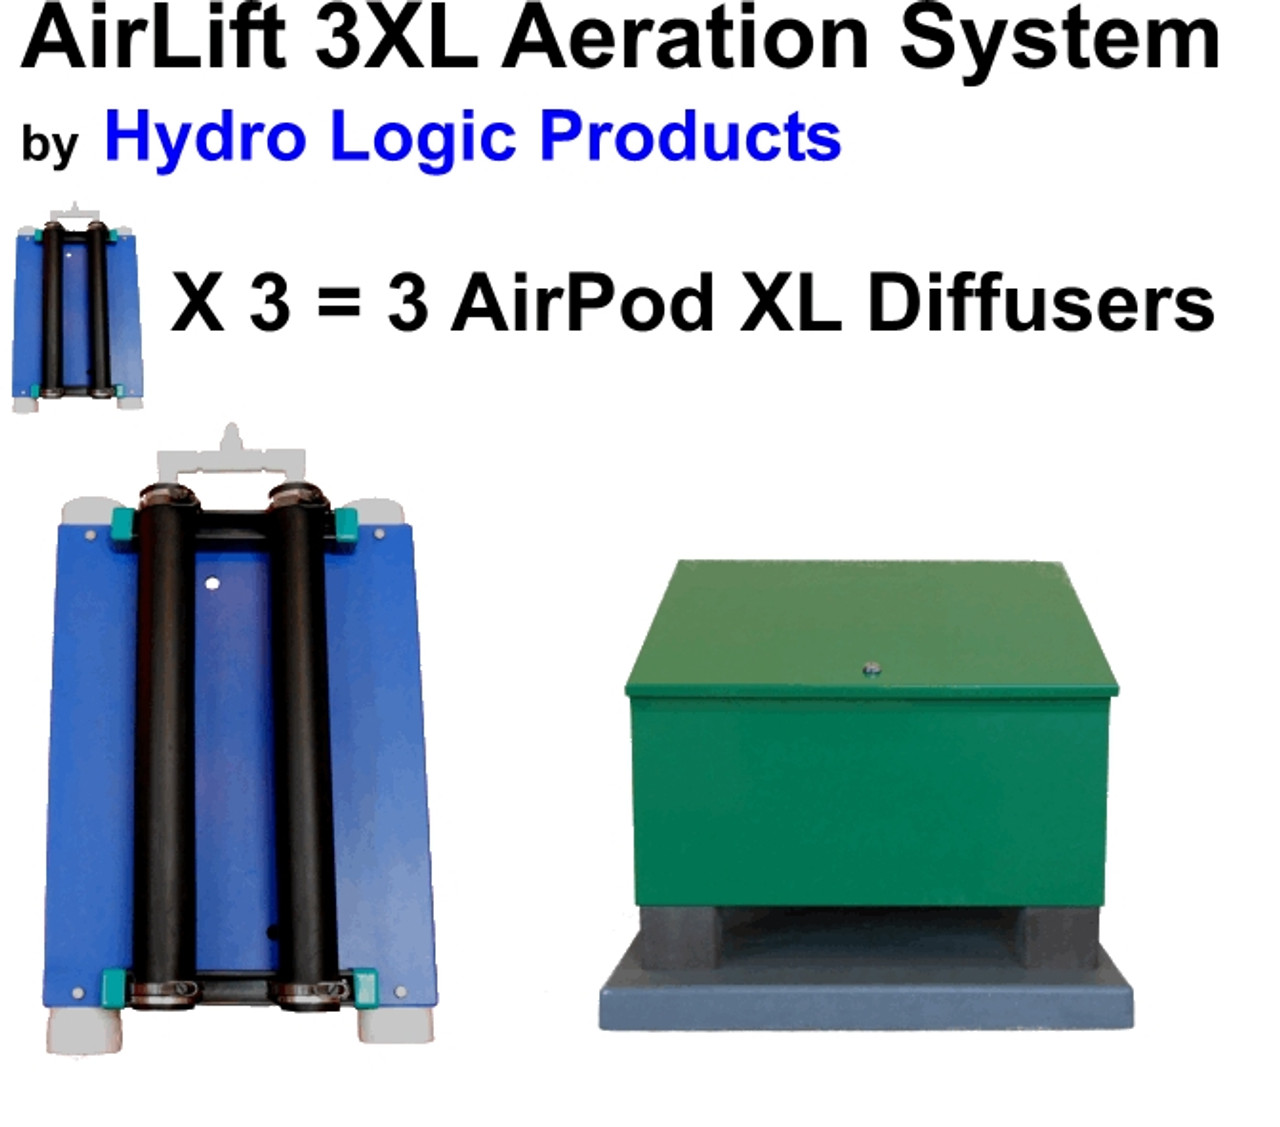 Lake Aerator and Lake Aeration System by Hydro Logic